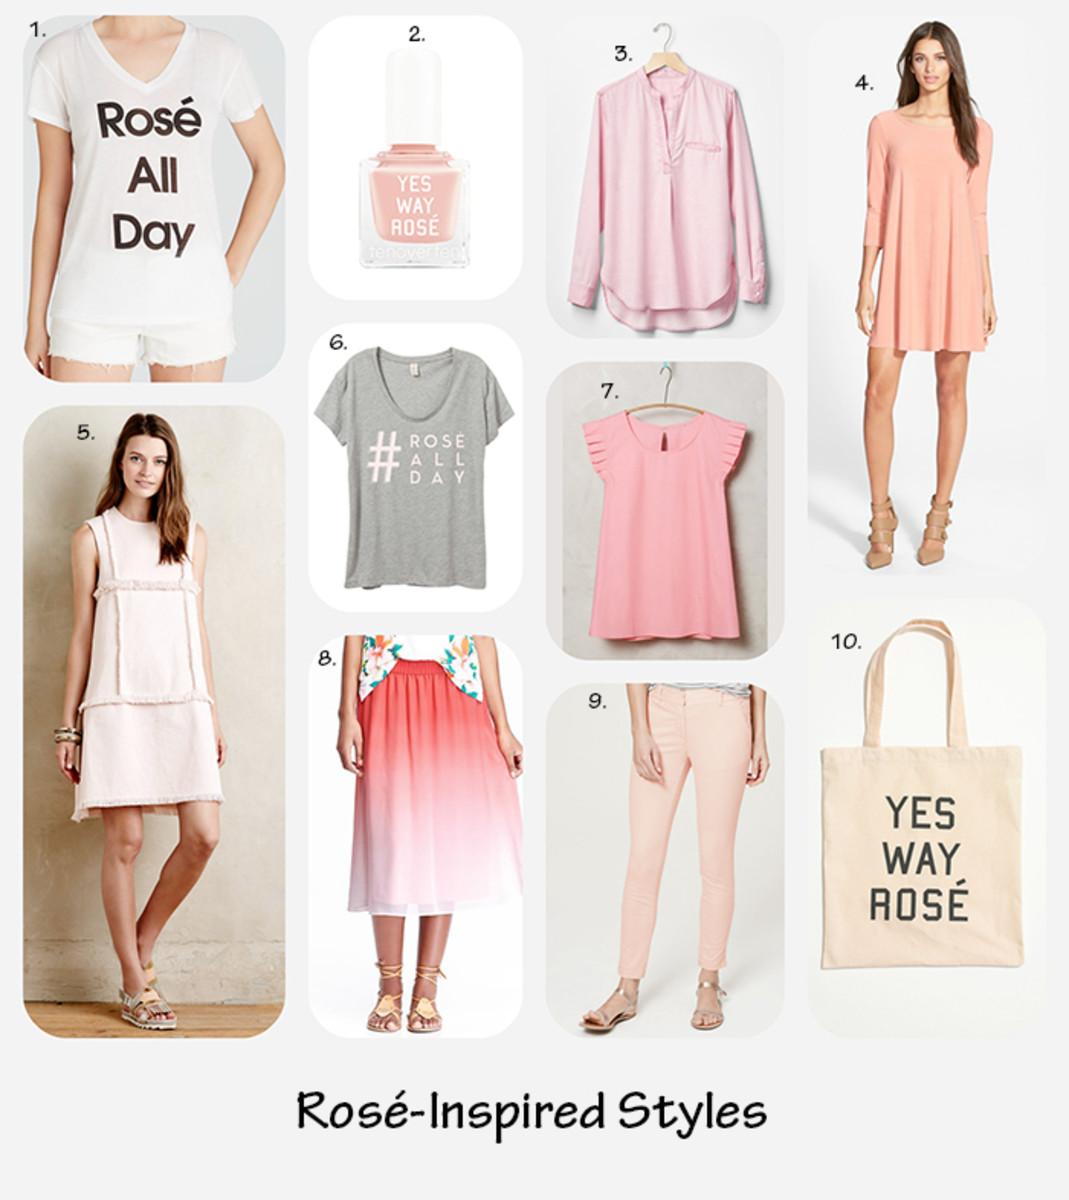 rose styles